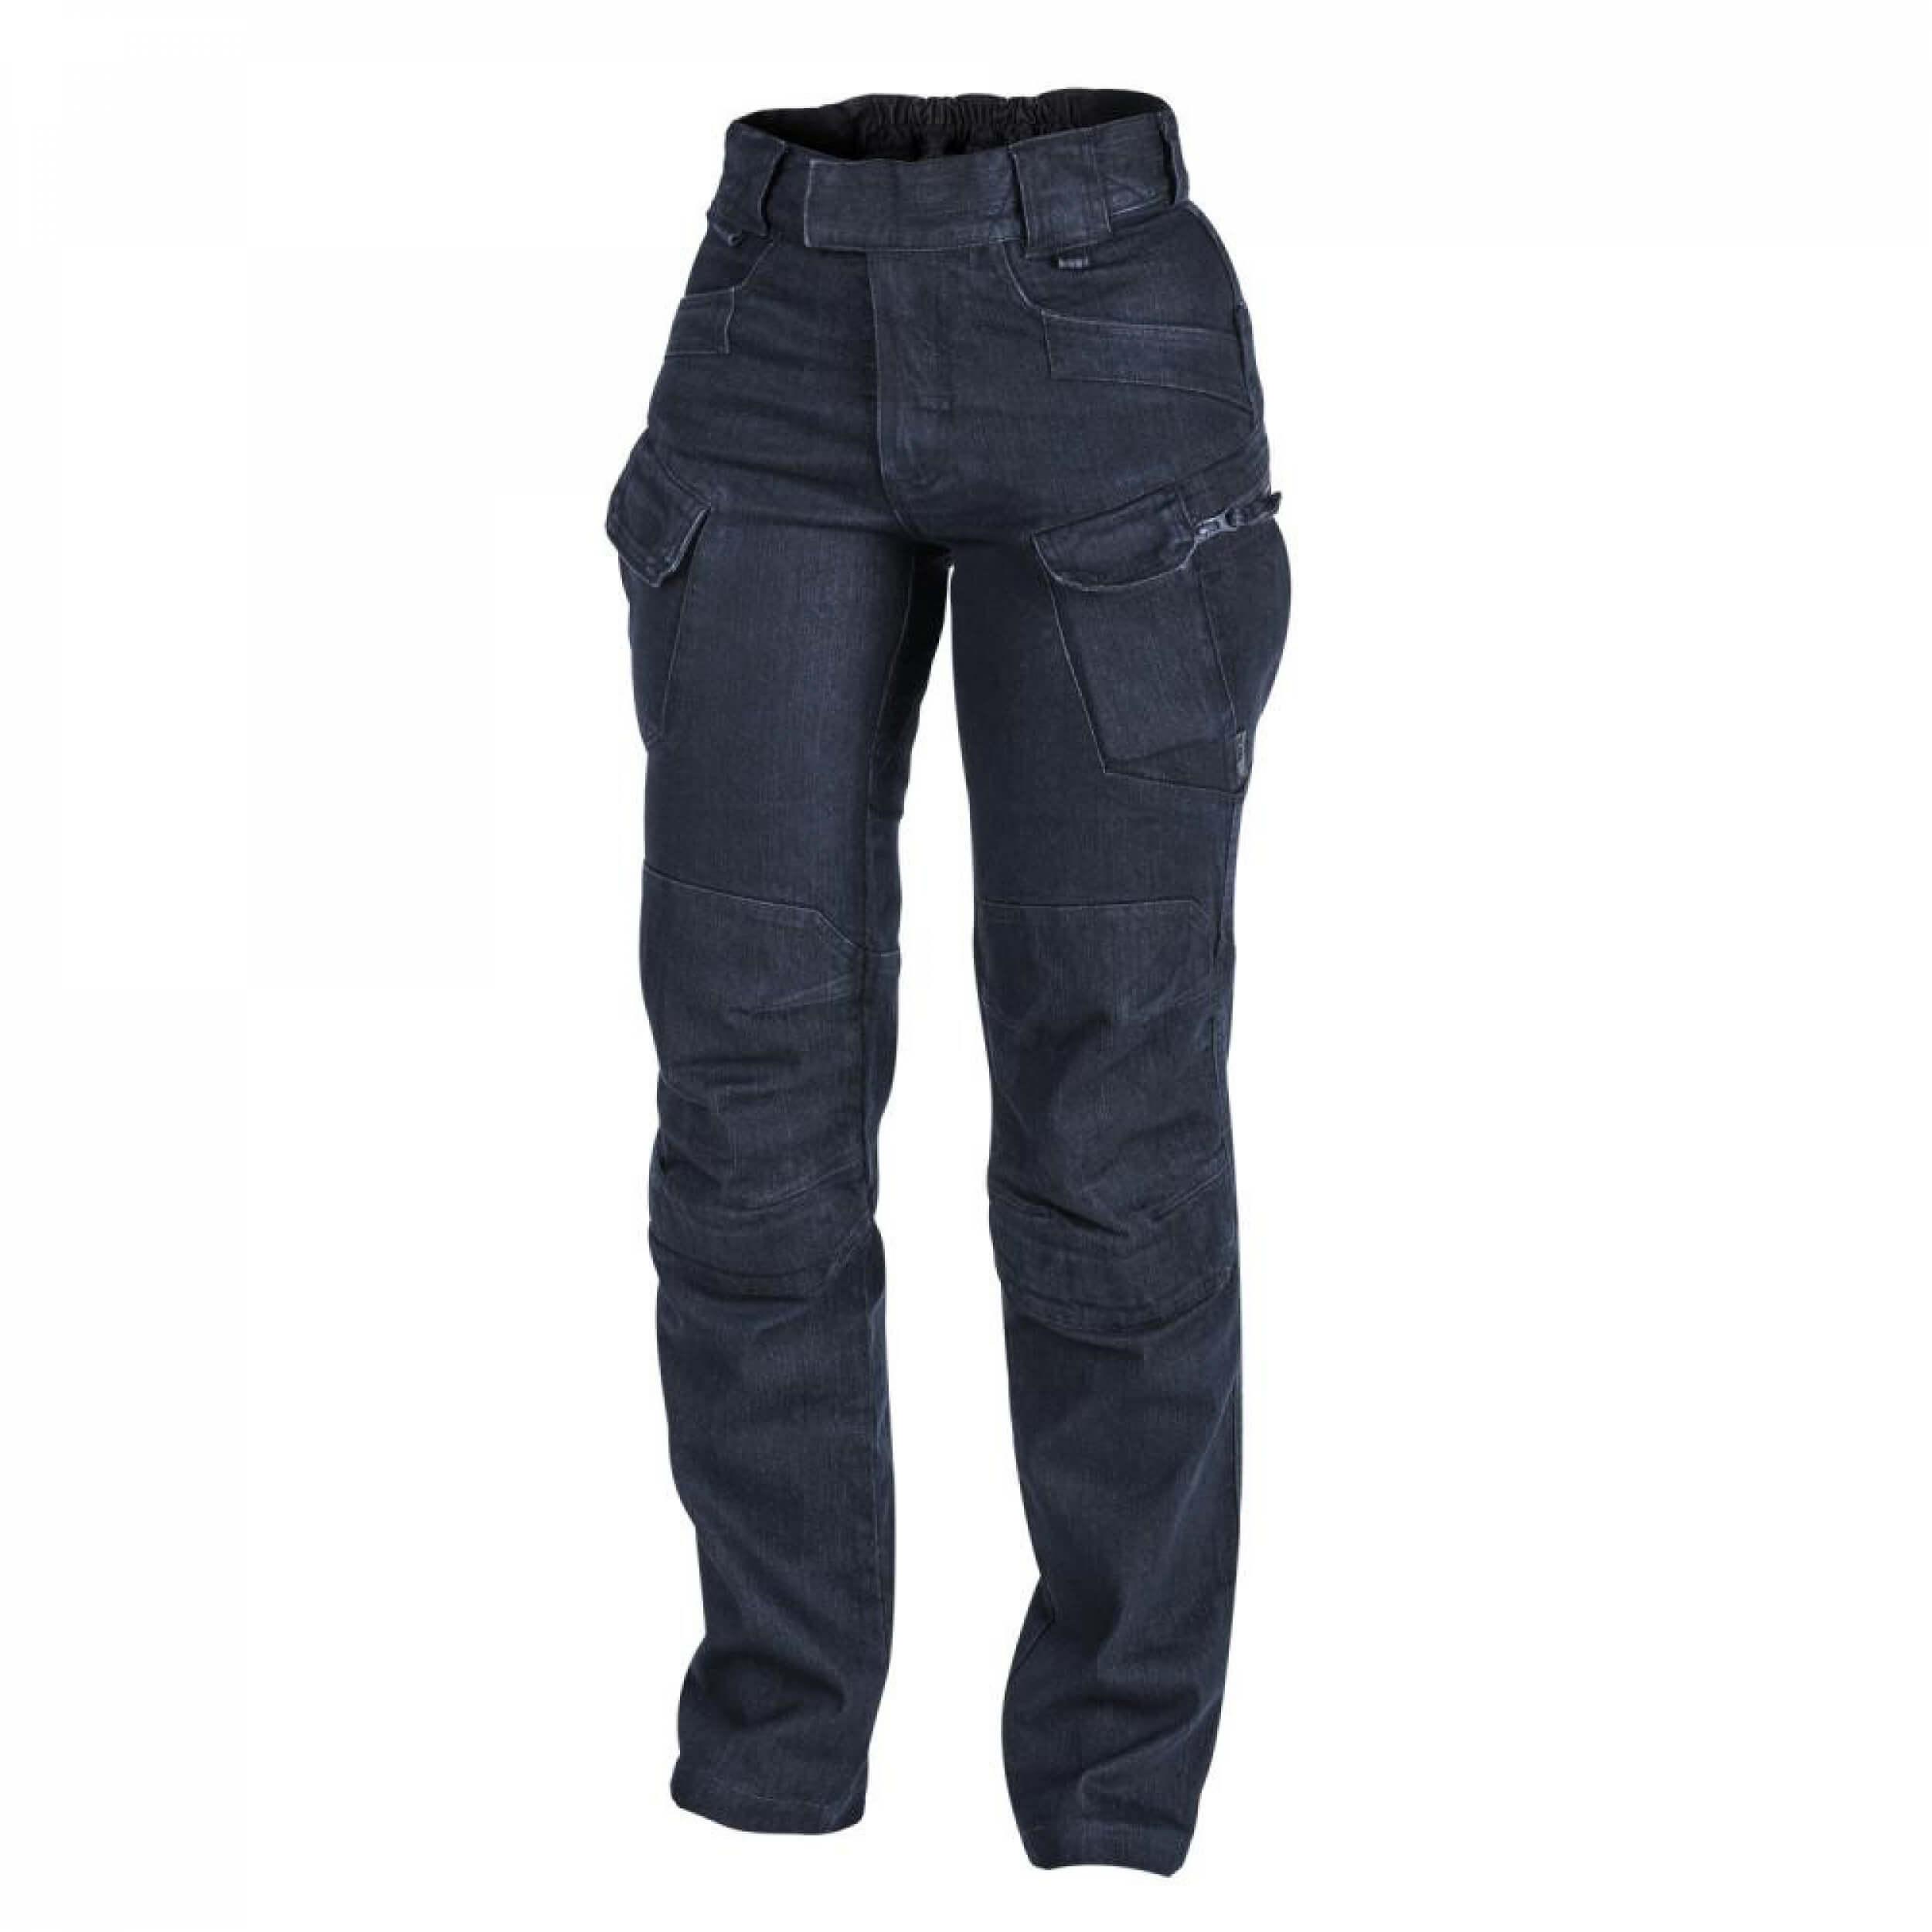 Helikon-Tex Womens UTP Urban Tactical Pants - Denim - Dark Blue